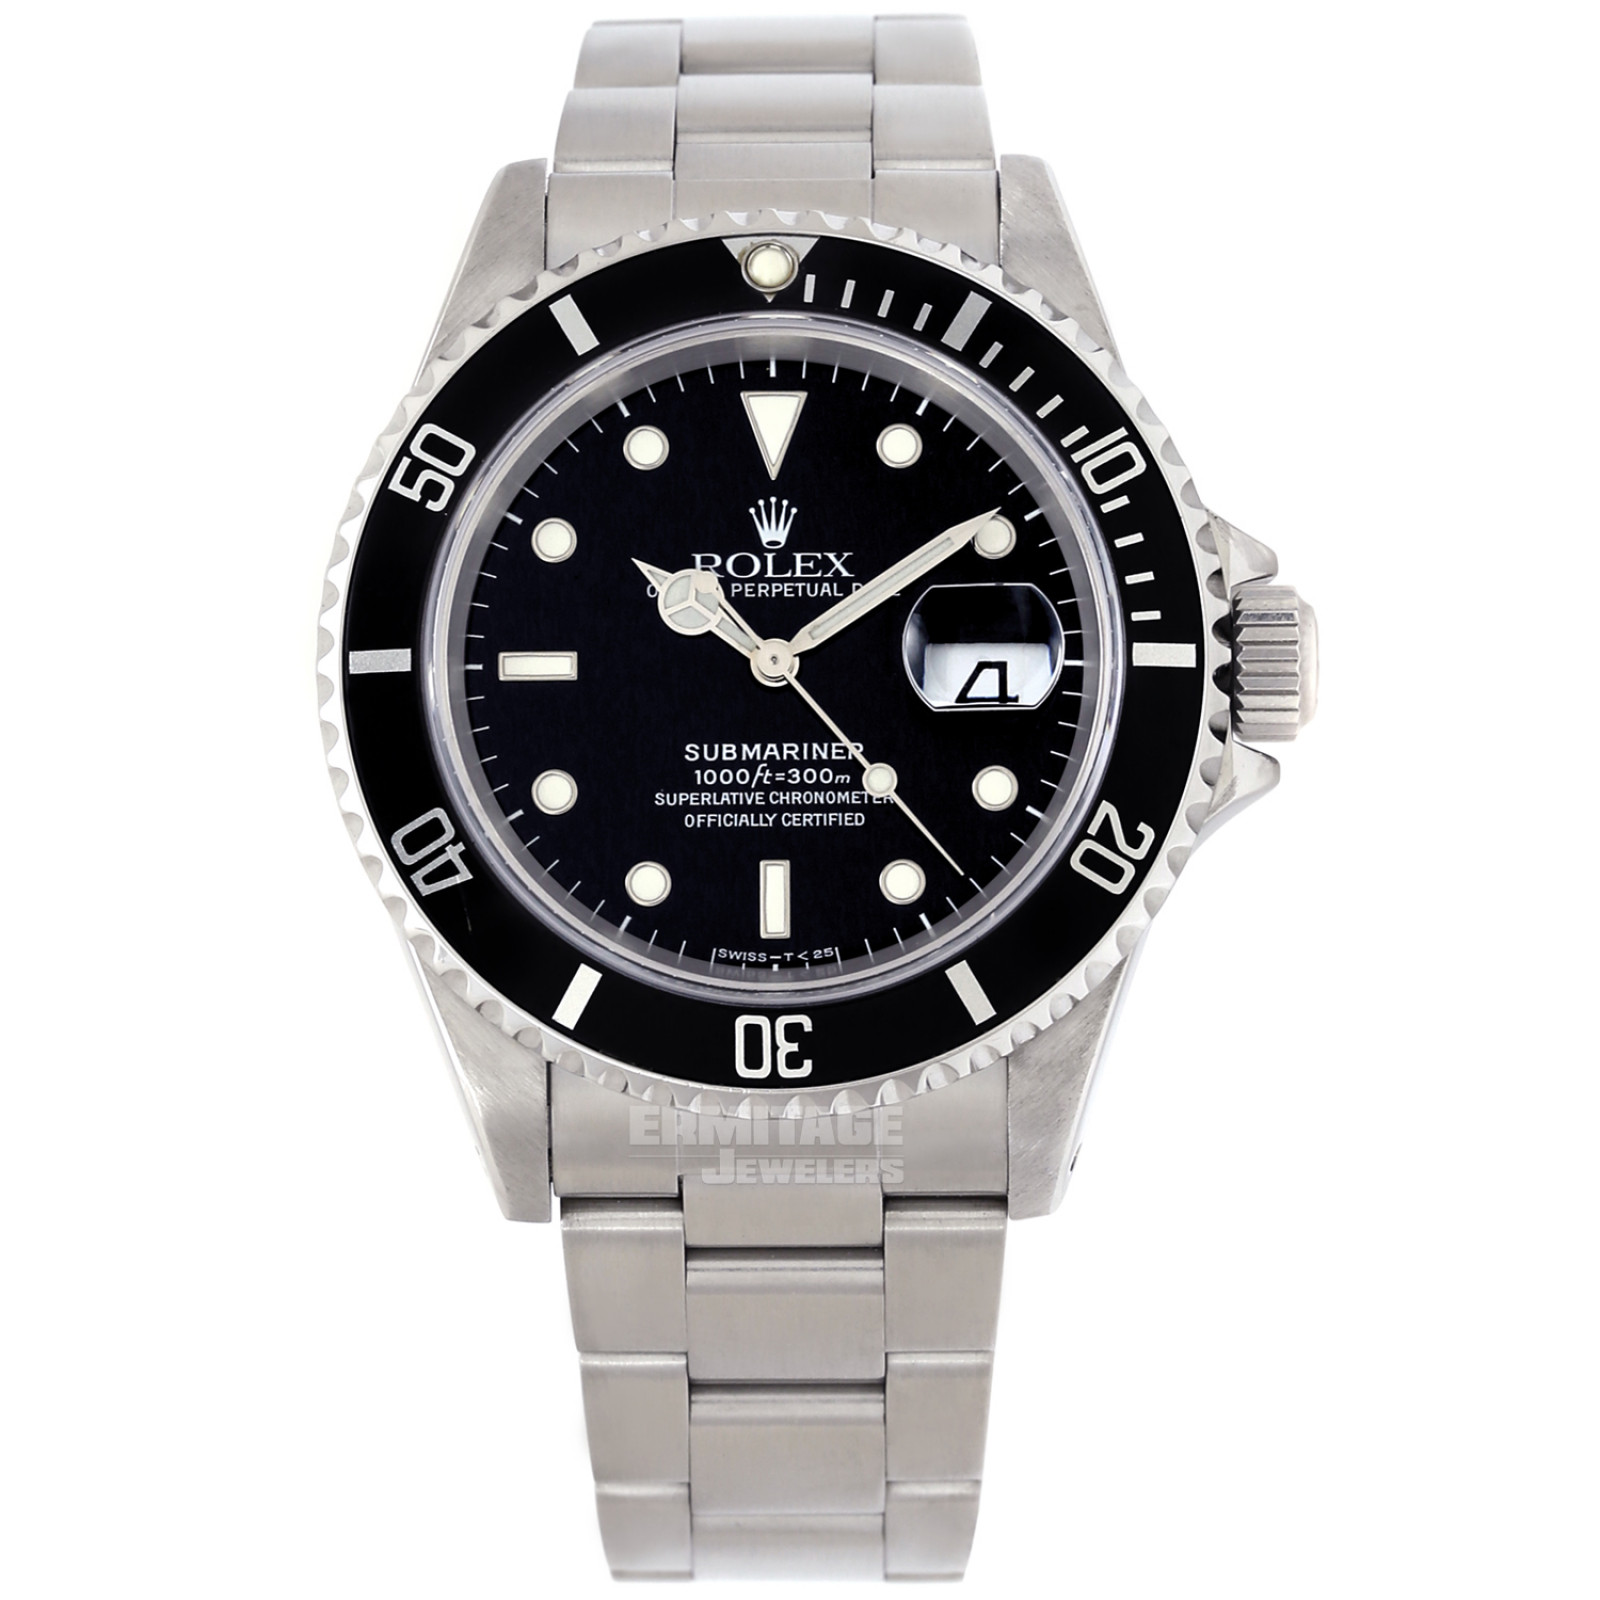 Rolex Submariner 16610 Excellent Condition